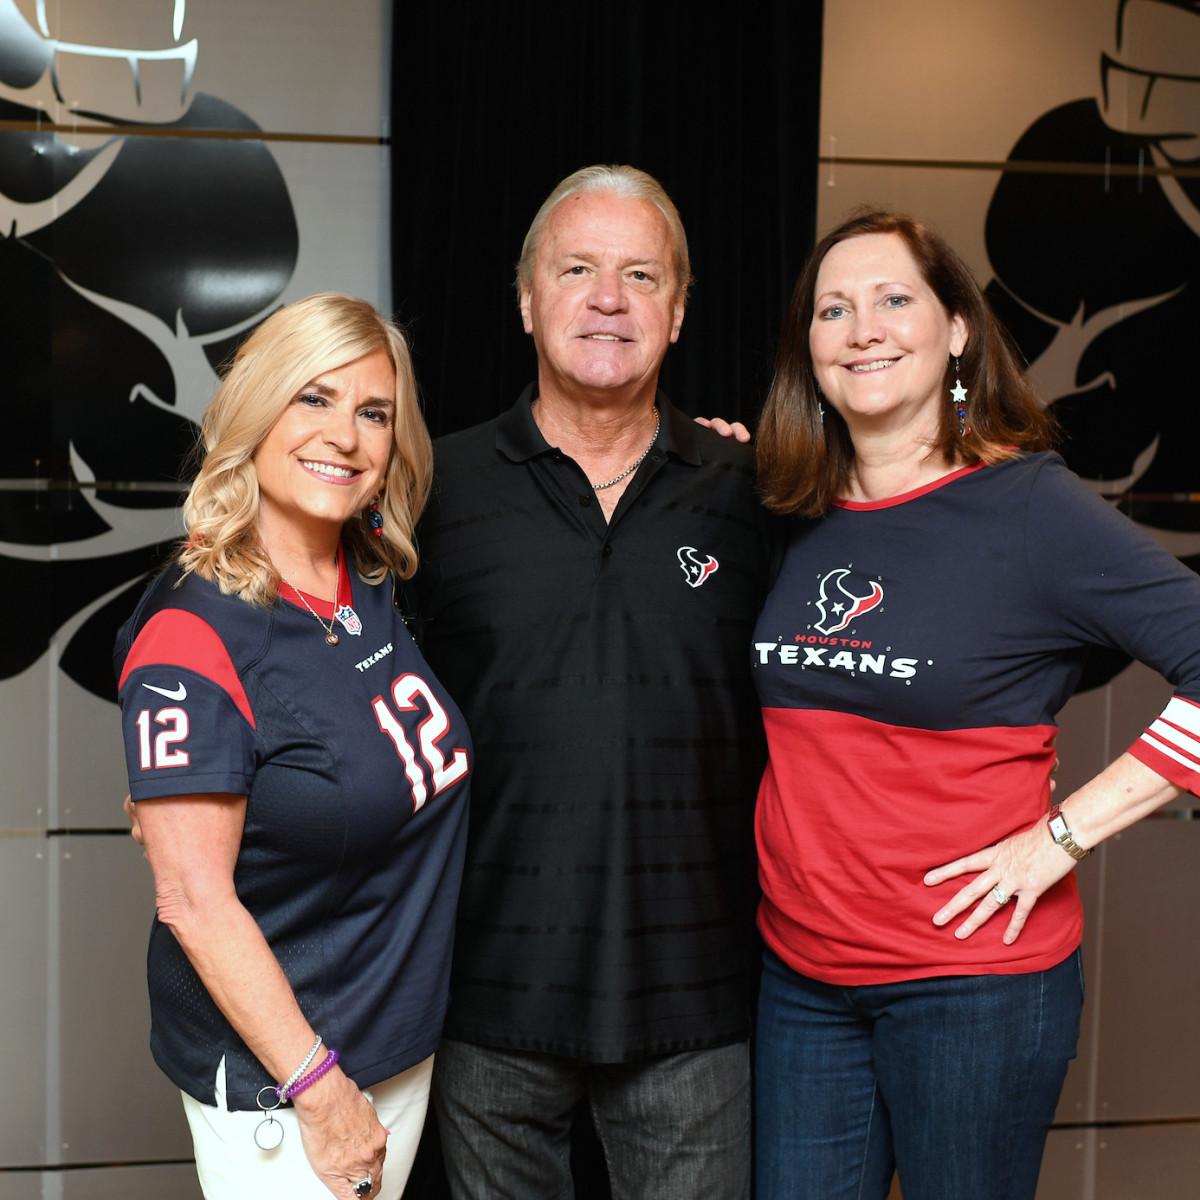 Houston, Boys and Girls Harbor Fantasy Football Draft Night, Vicki Lehner, Bill Lehner, Diane Englet